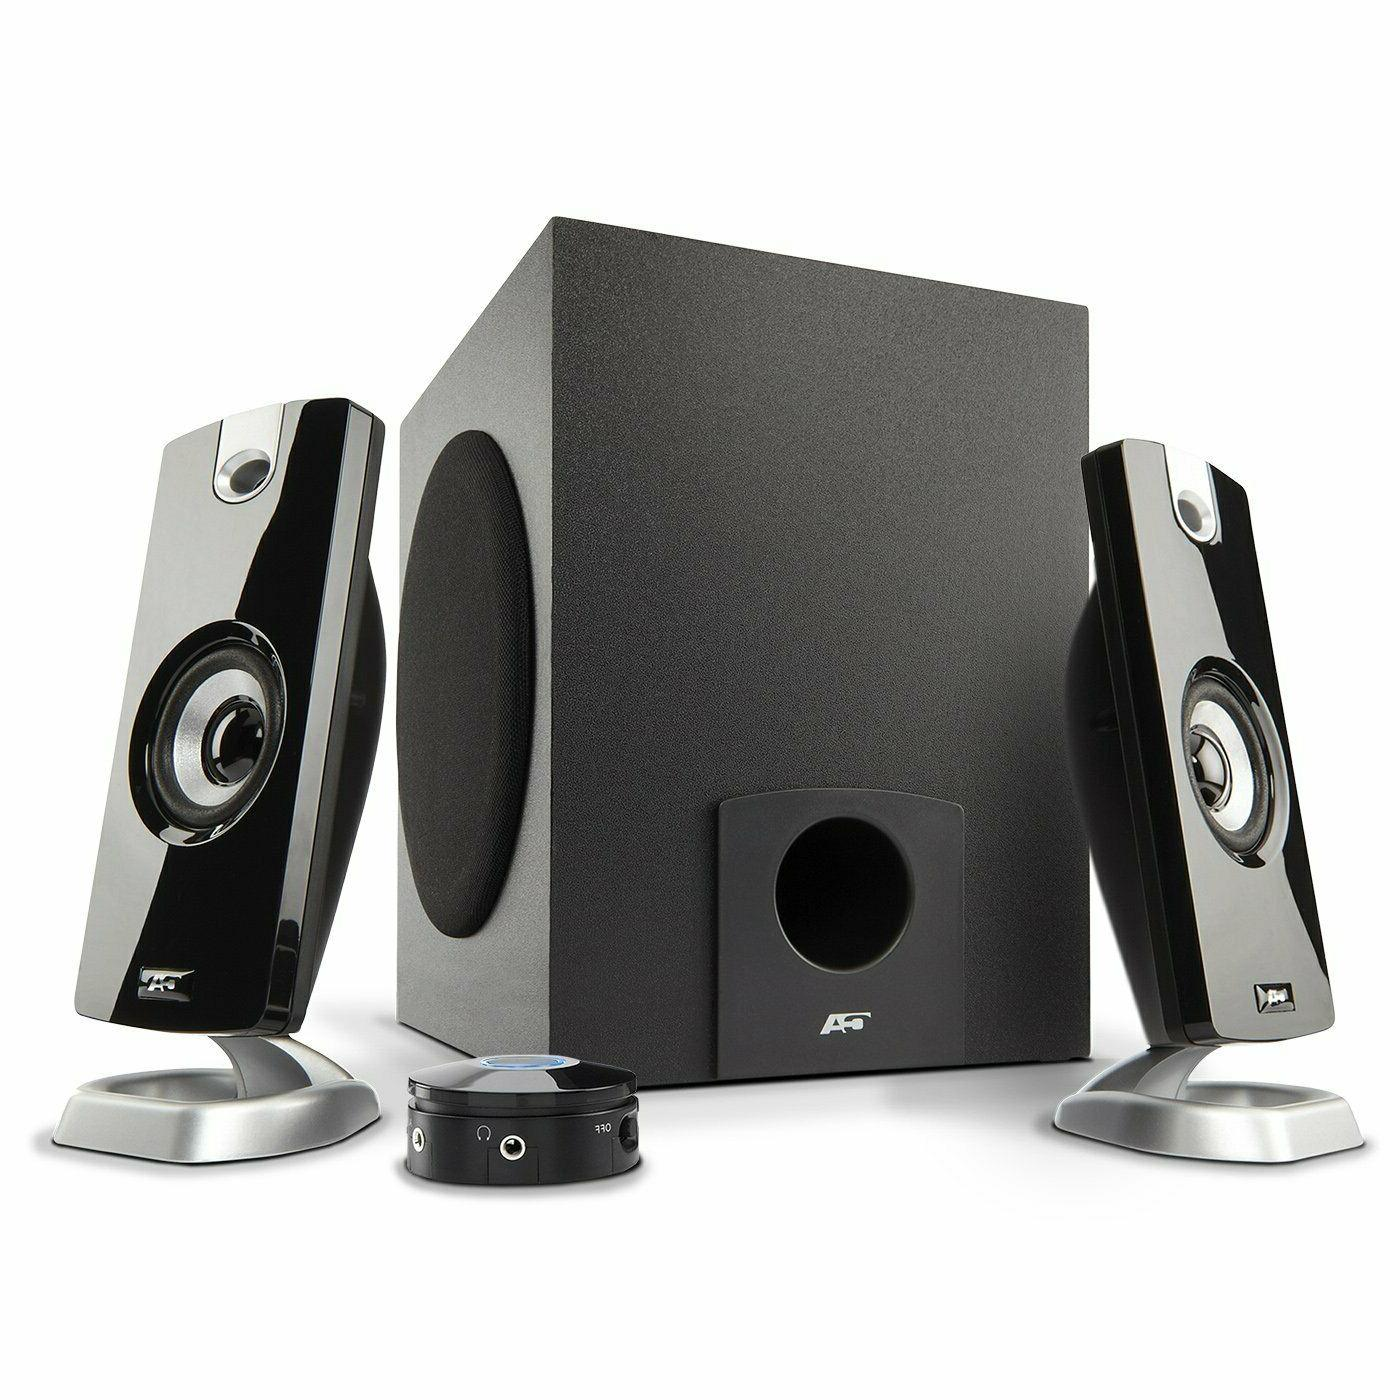 Computer PC Speakers 2.1 Desktop with Subwoofer Audio Laptop